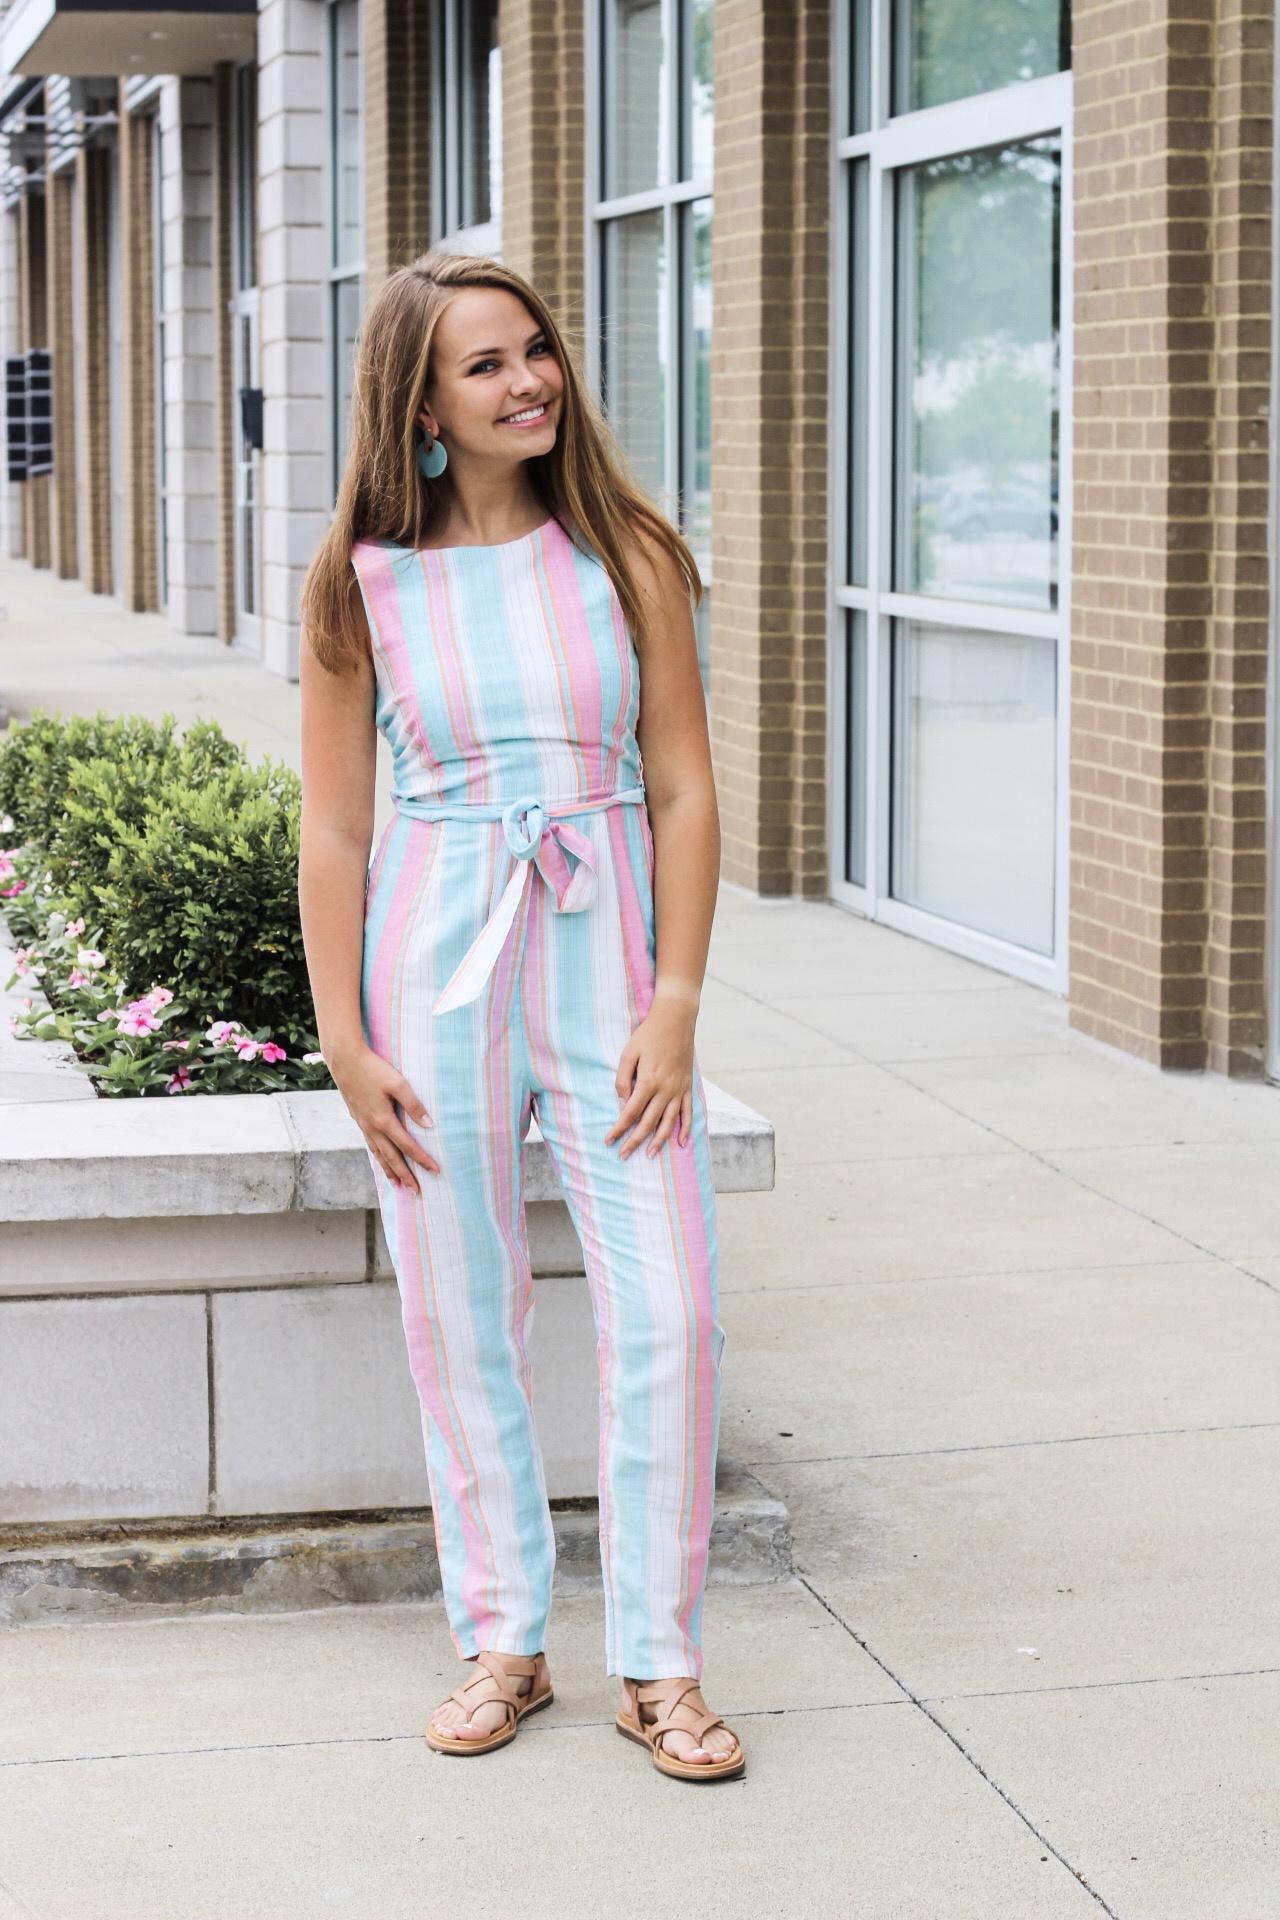 Teal/Pink Striped Jumpsuit w/ Wrap Tie Waist